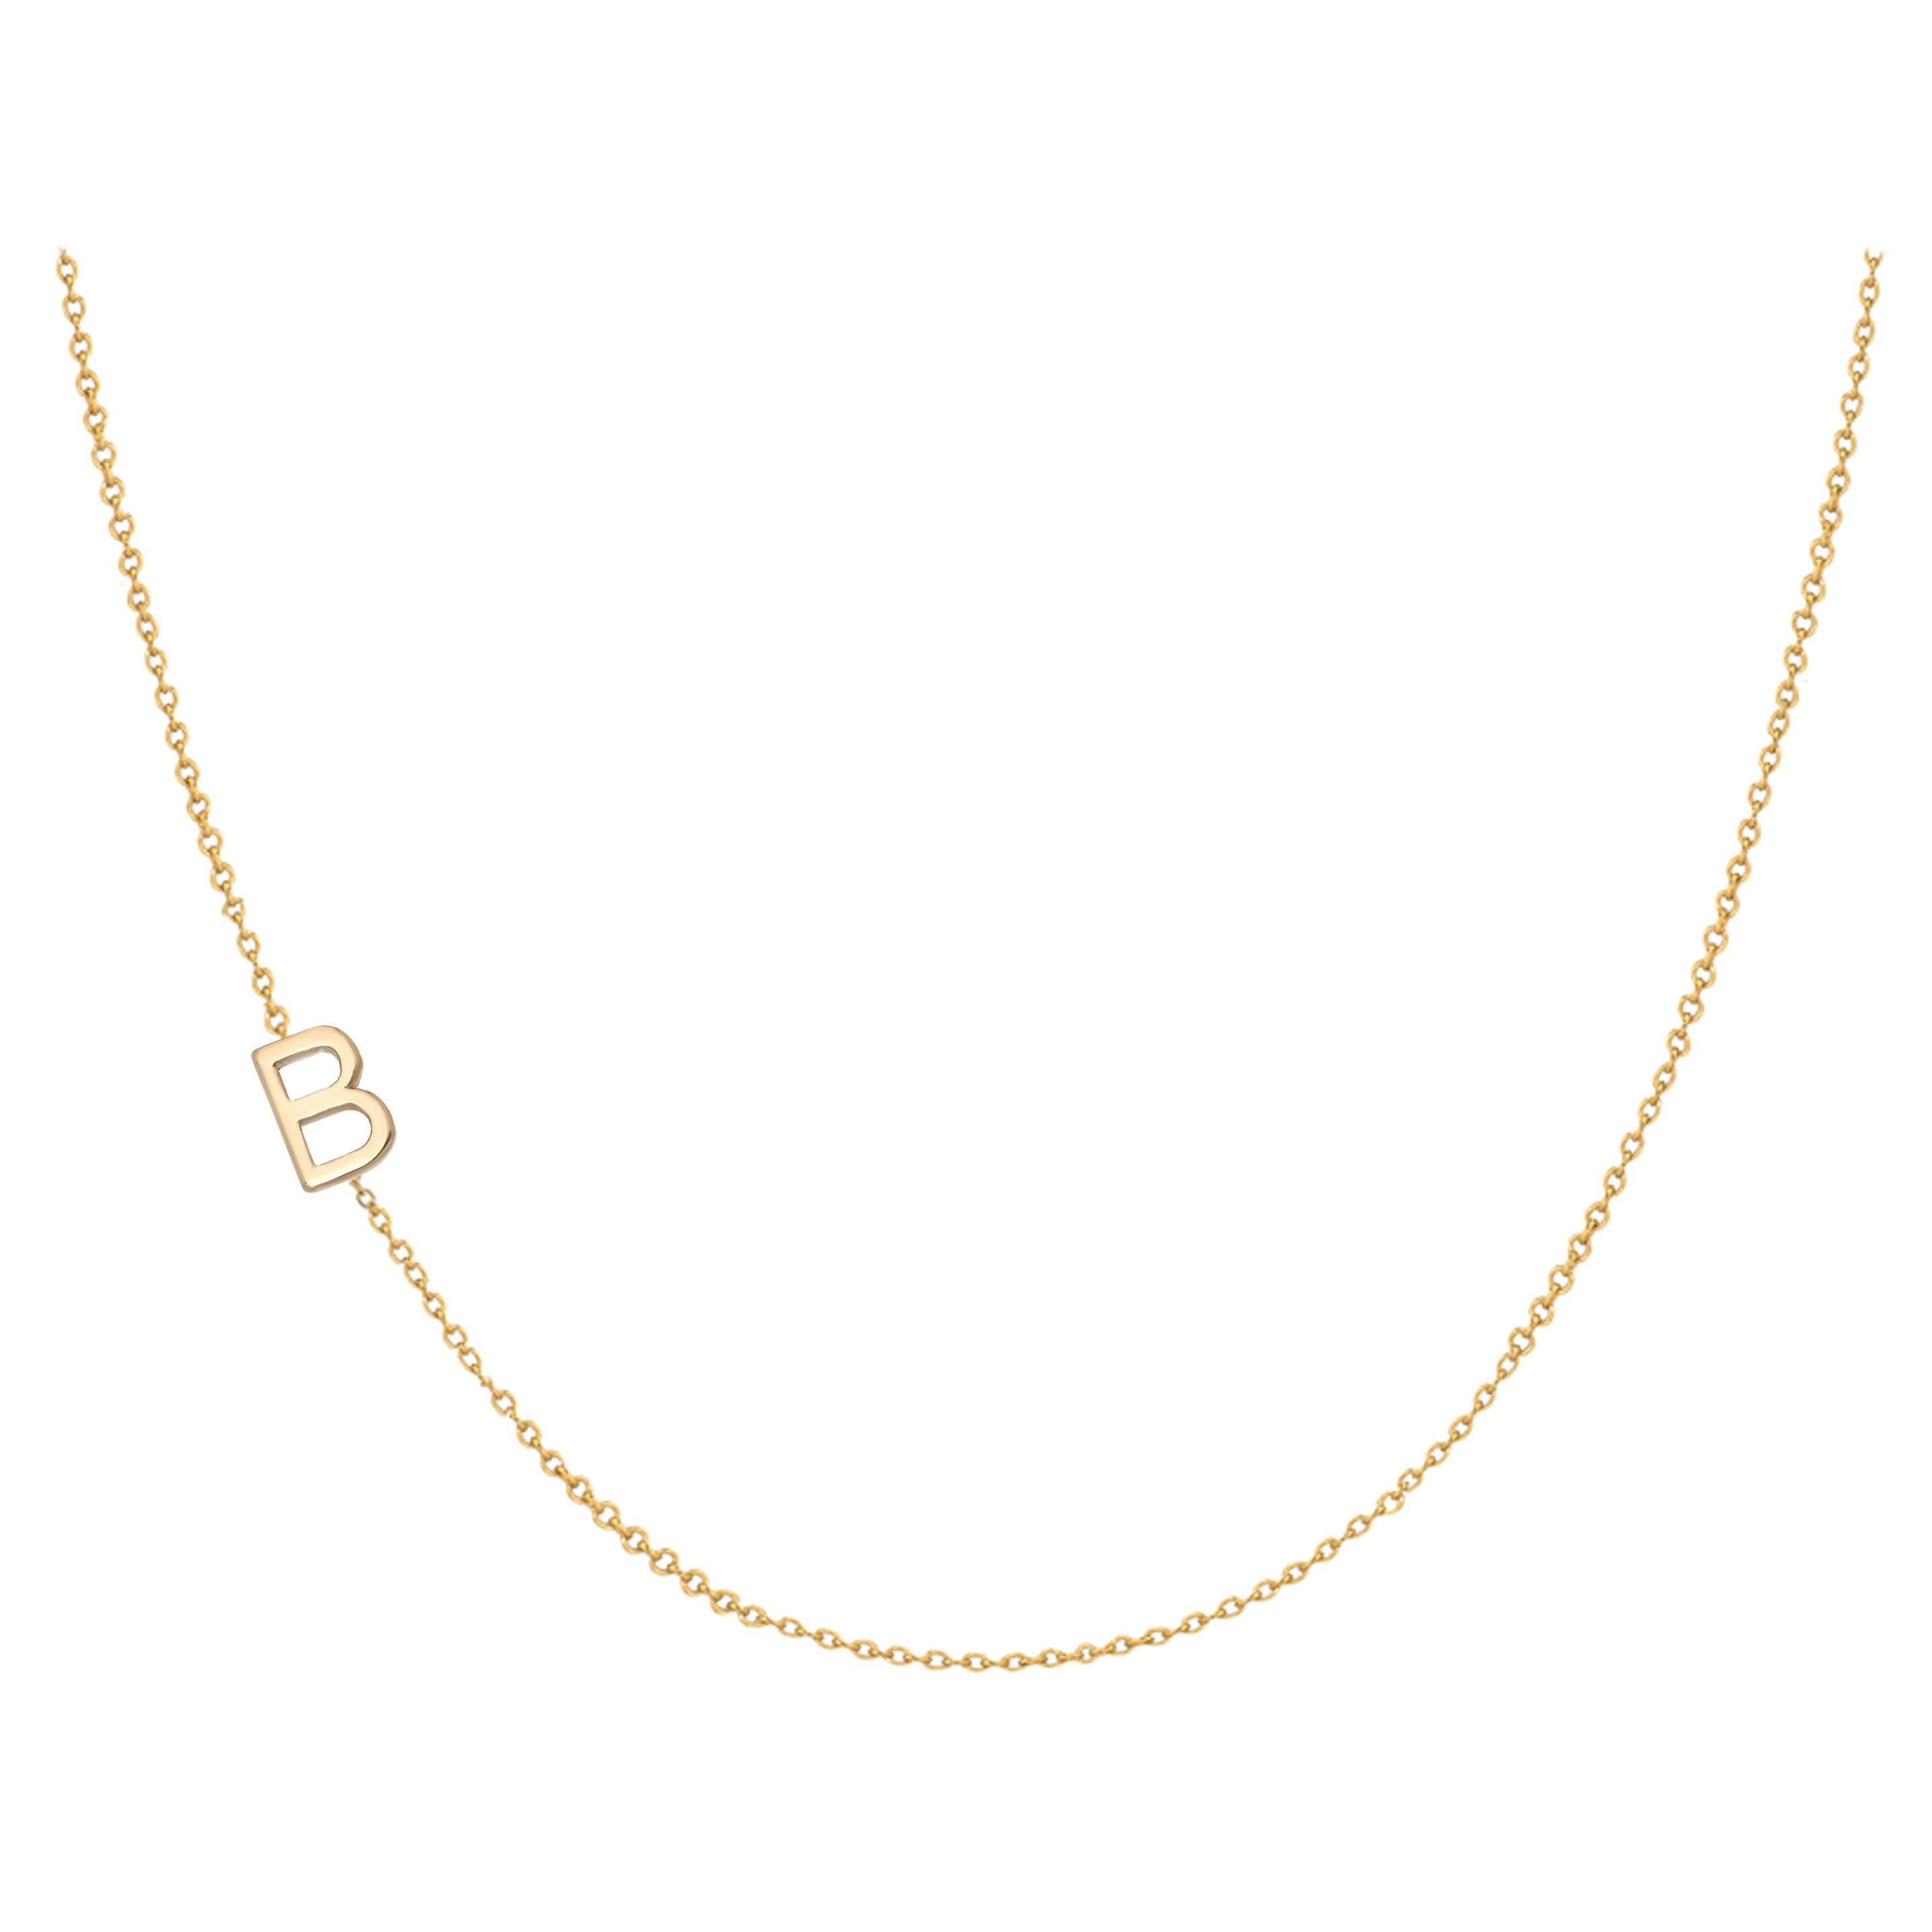 14 Karat Gold Asymmetrical Initial Necklace, B